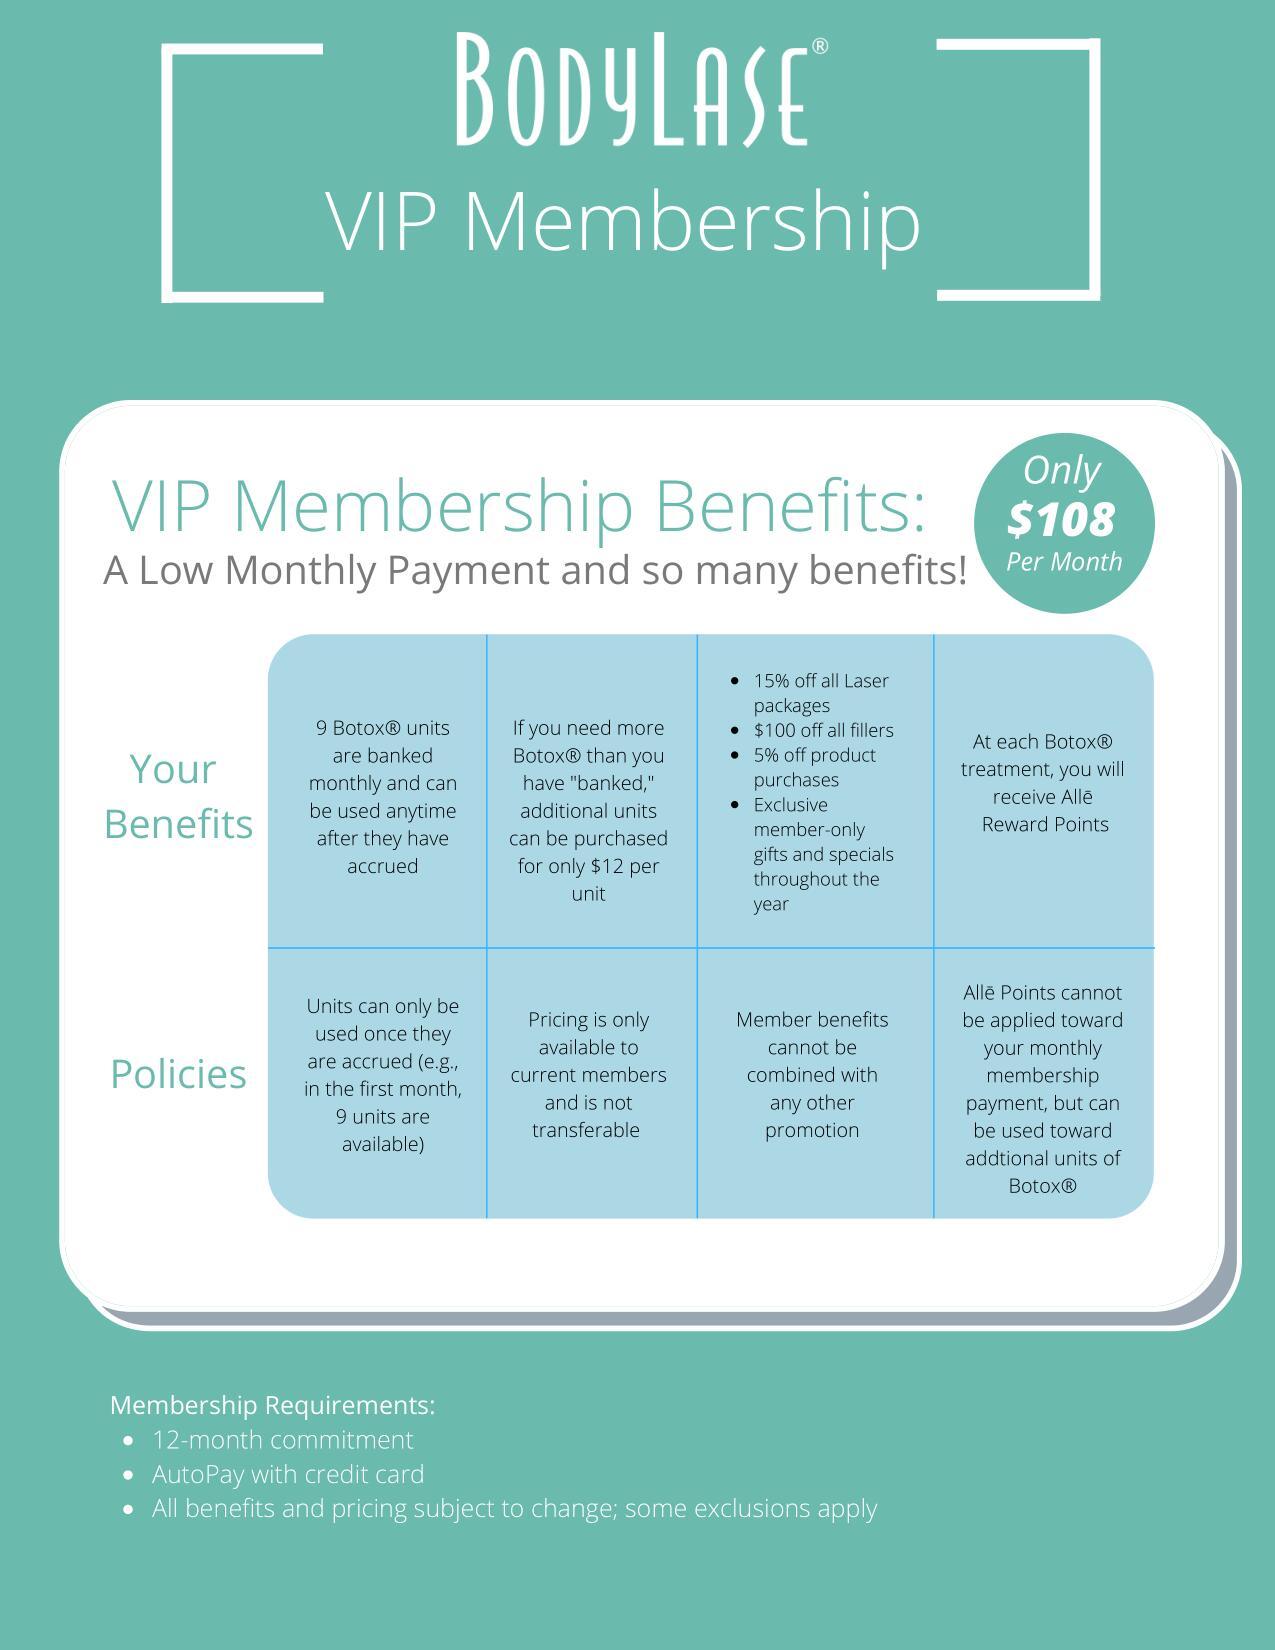 BodyLase VIP Membership benefits